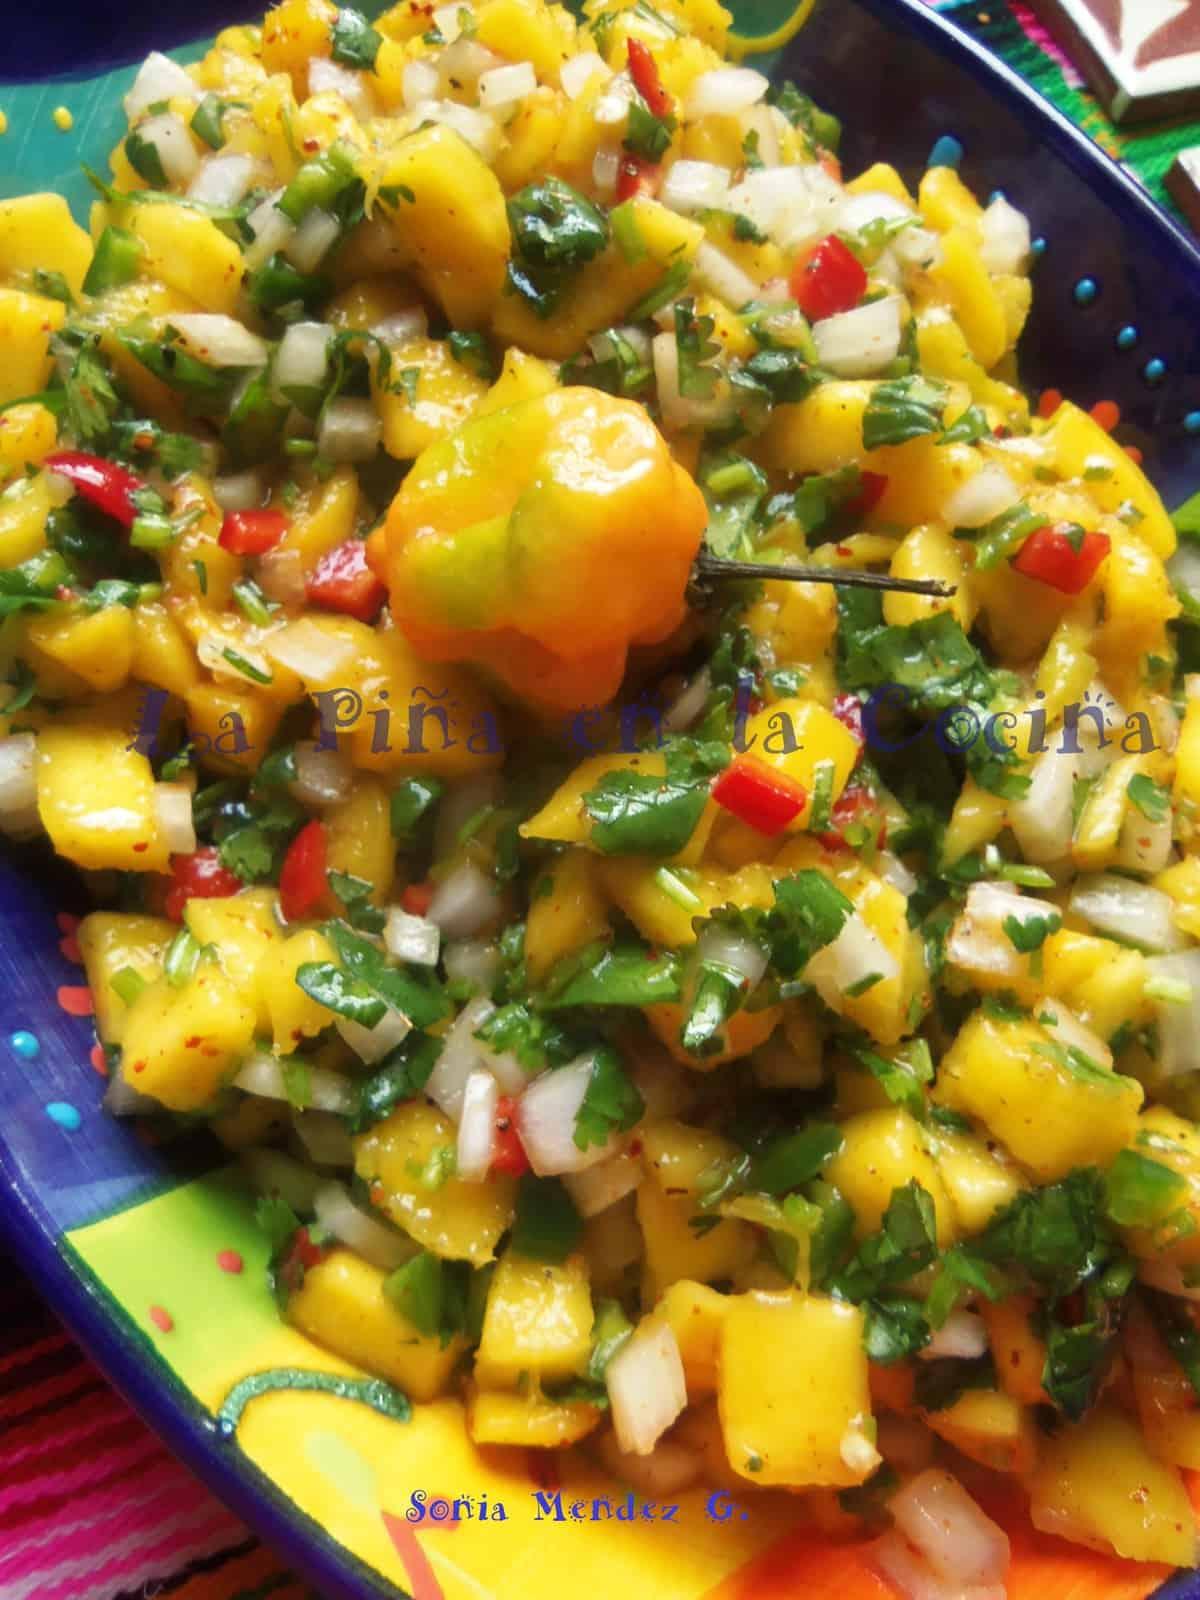 Fresh Mango Salsa with Habanero, Fresno and Serrano Chiles